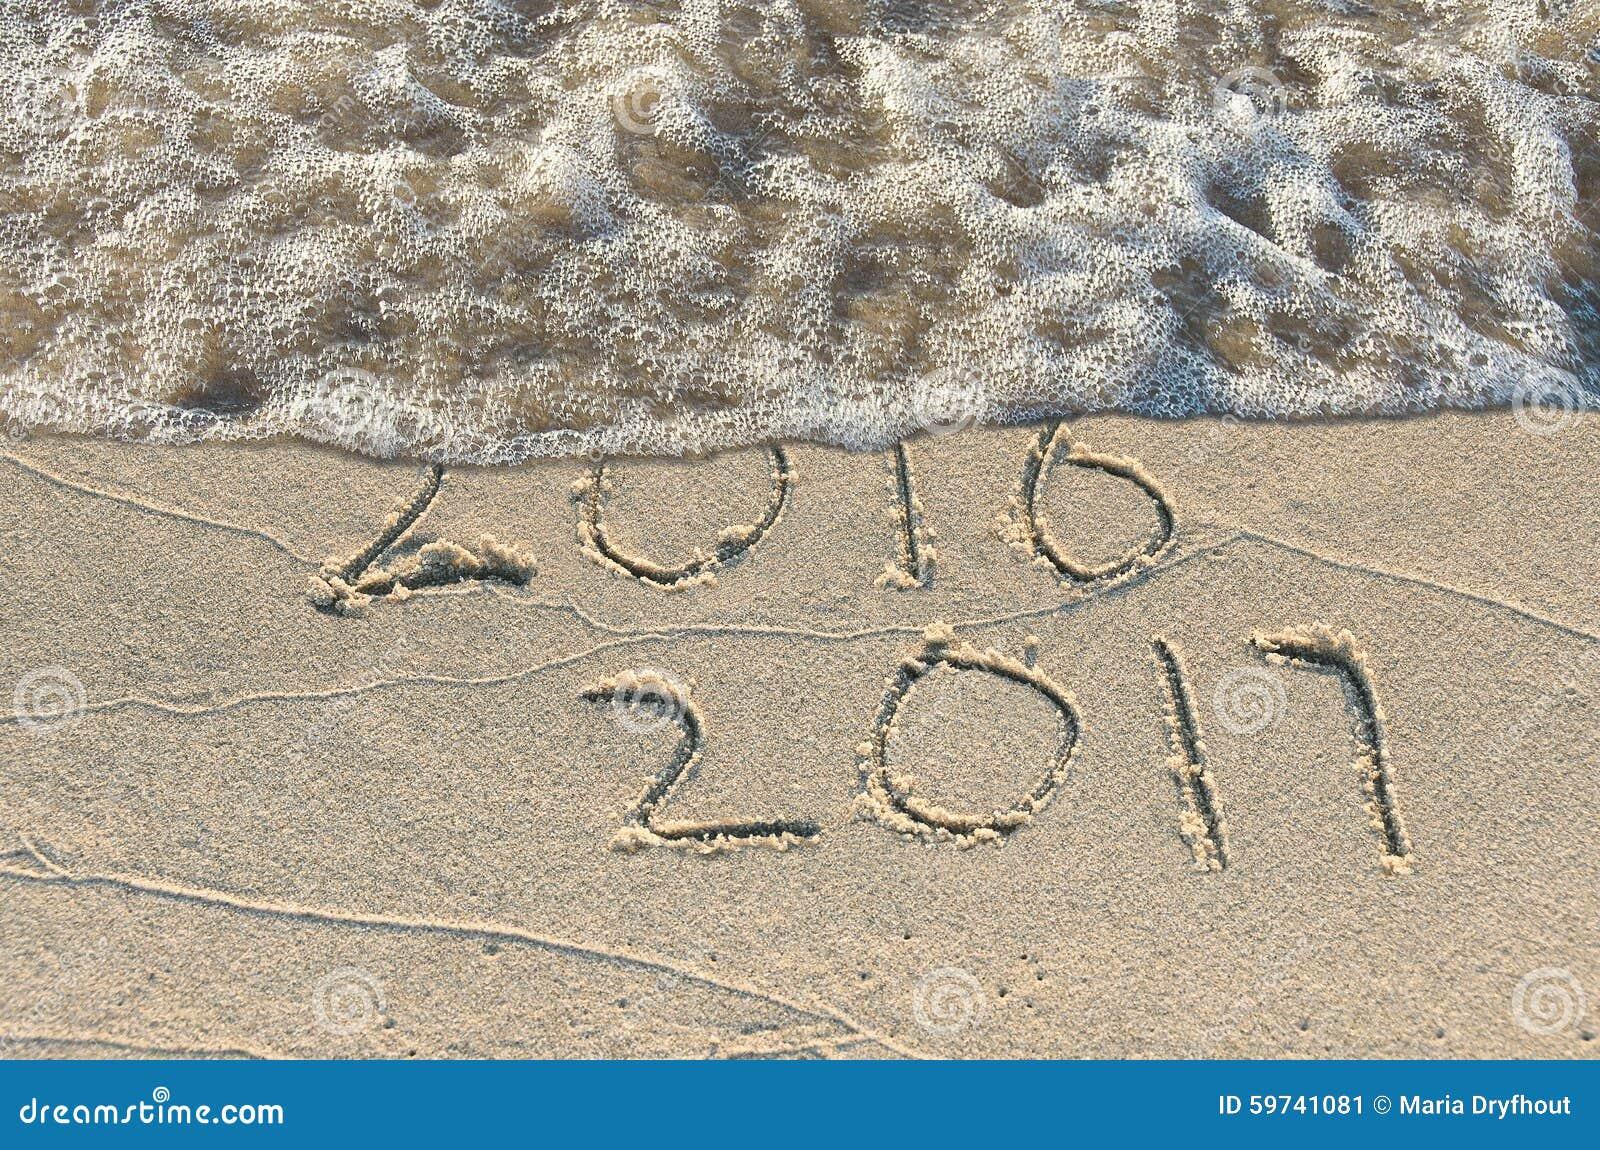 New year 2016 stock photo image 58693644 - Neues Jahr 2017 Im Sand Stockbild